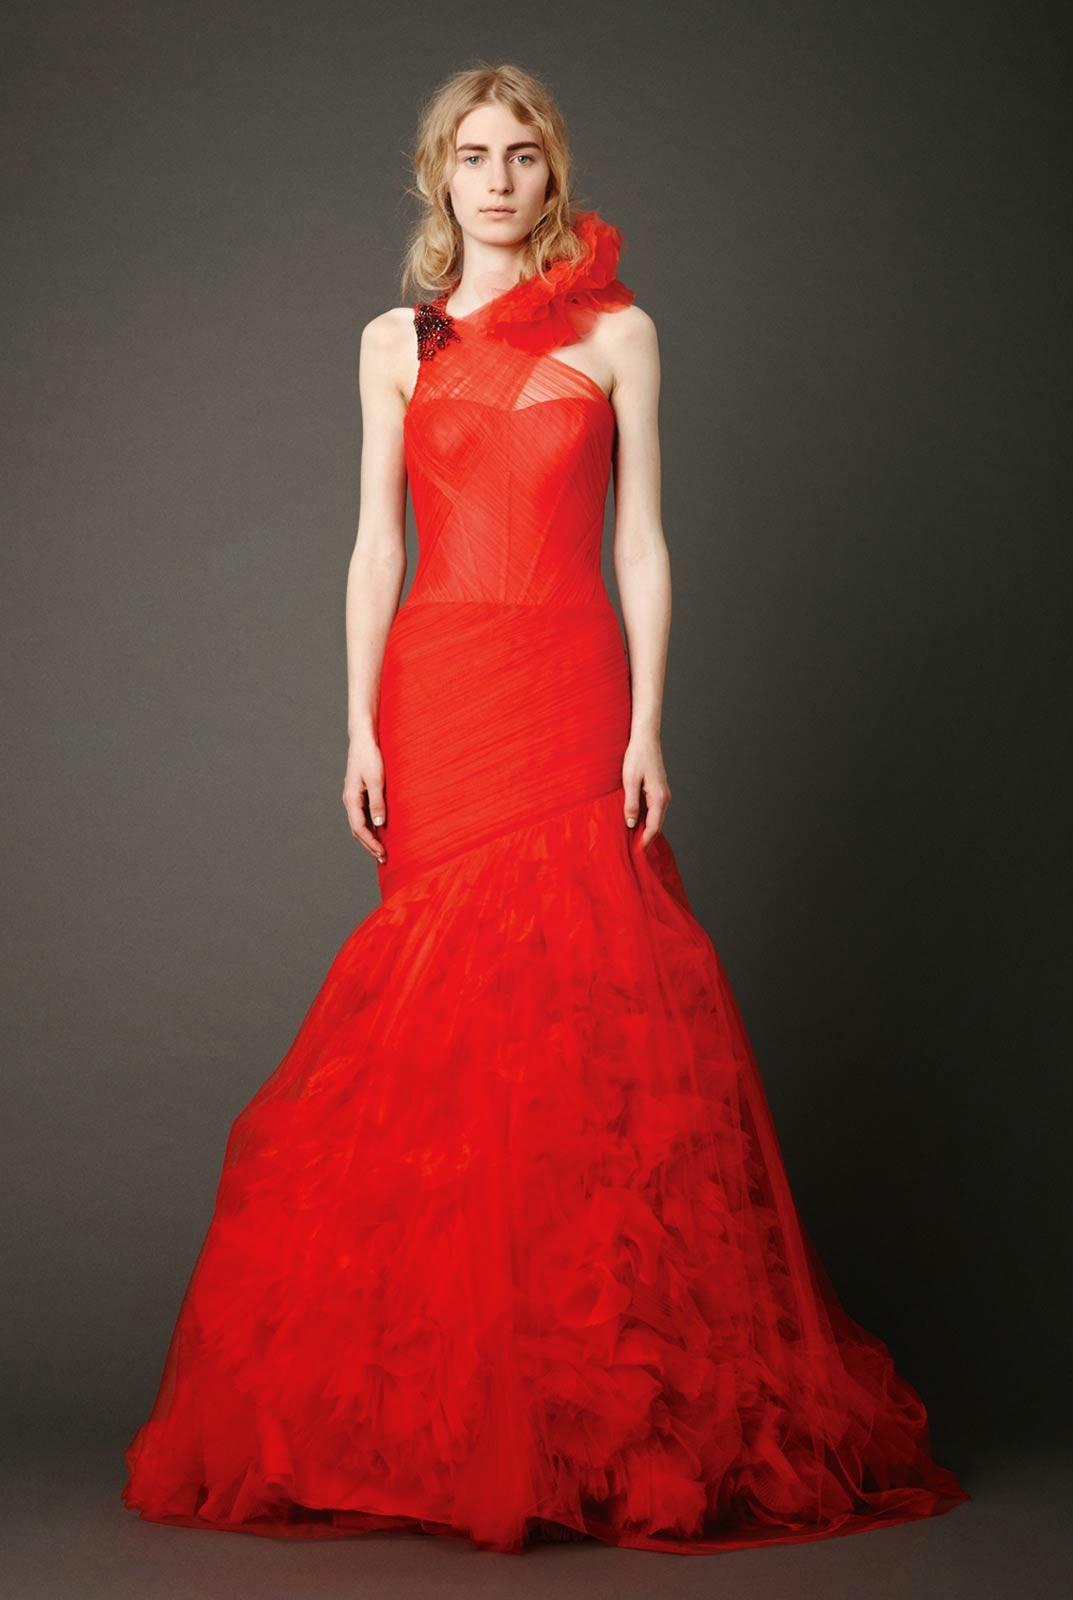 Red Wedding Dresses Summer 2013 Photos HD Design Ideas